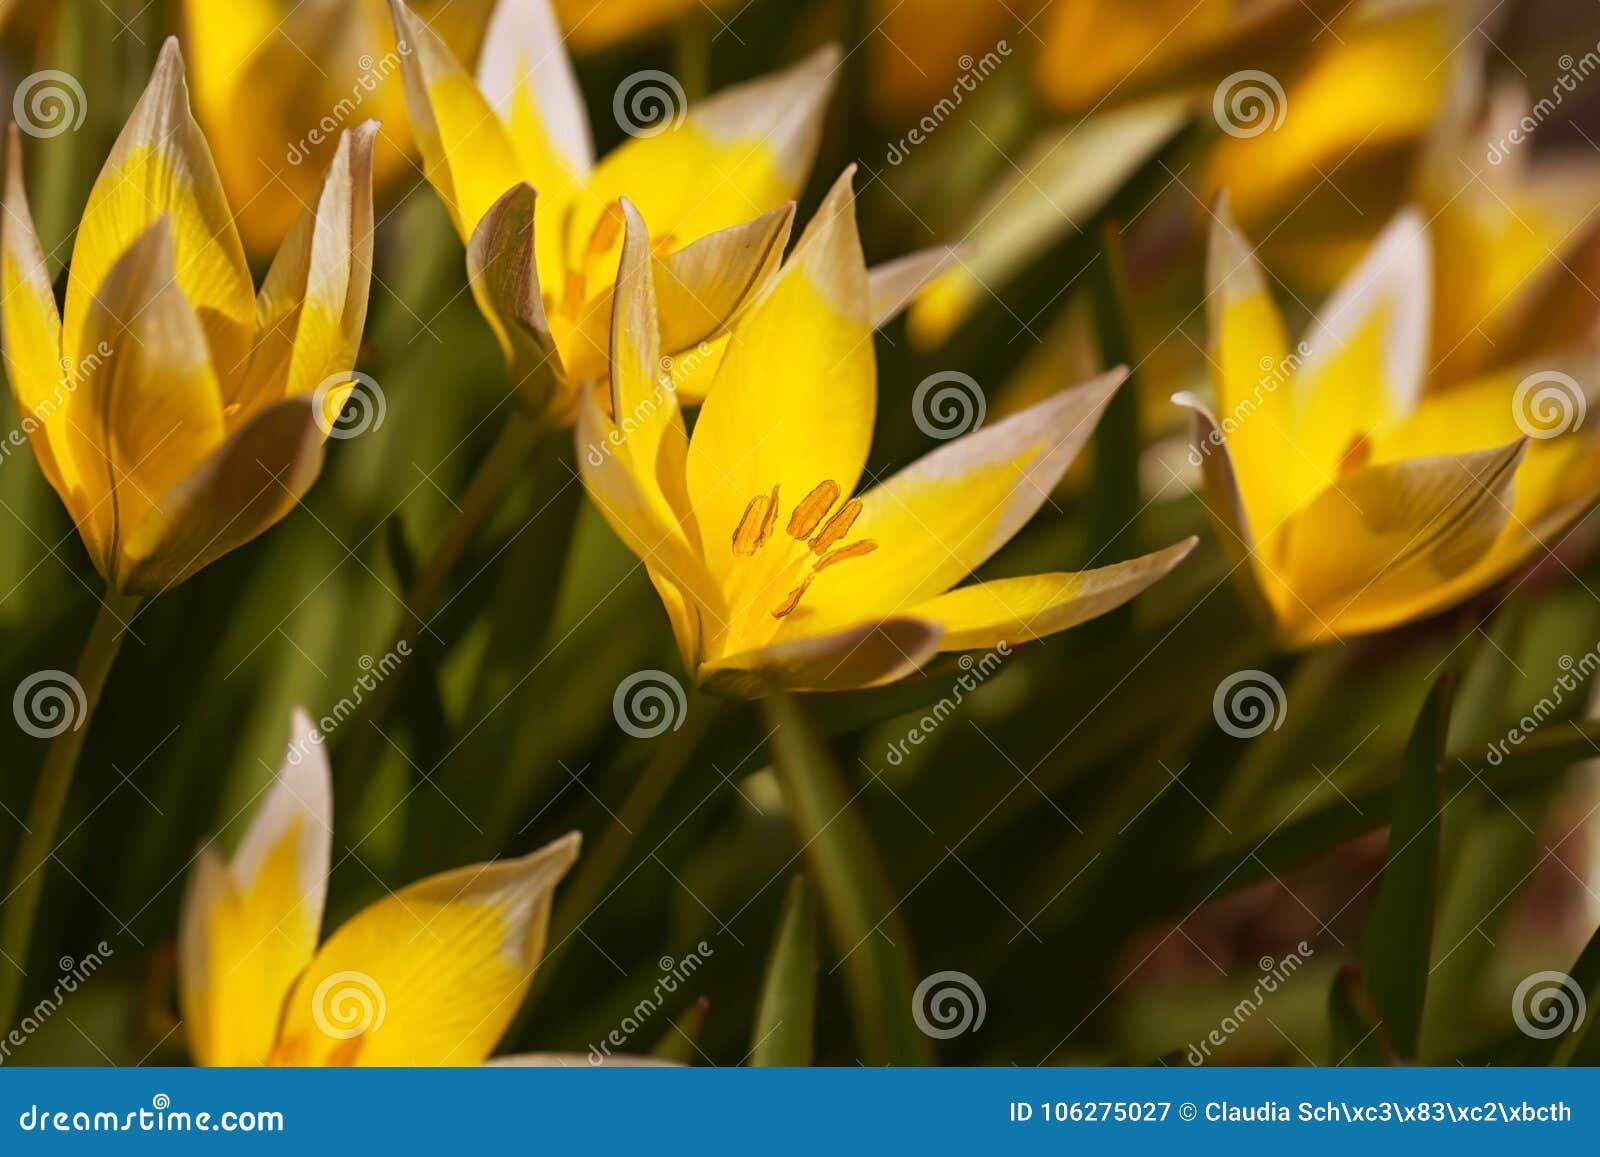 A bundle of yellow wild tulips. Tulipa tarda